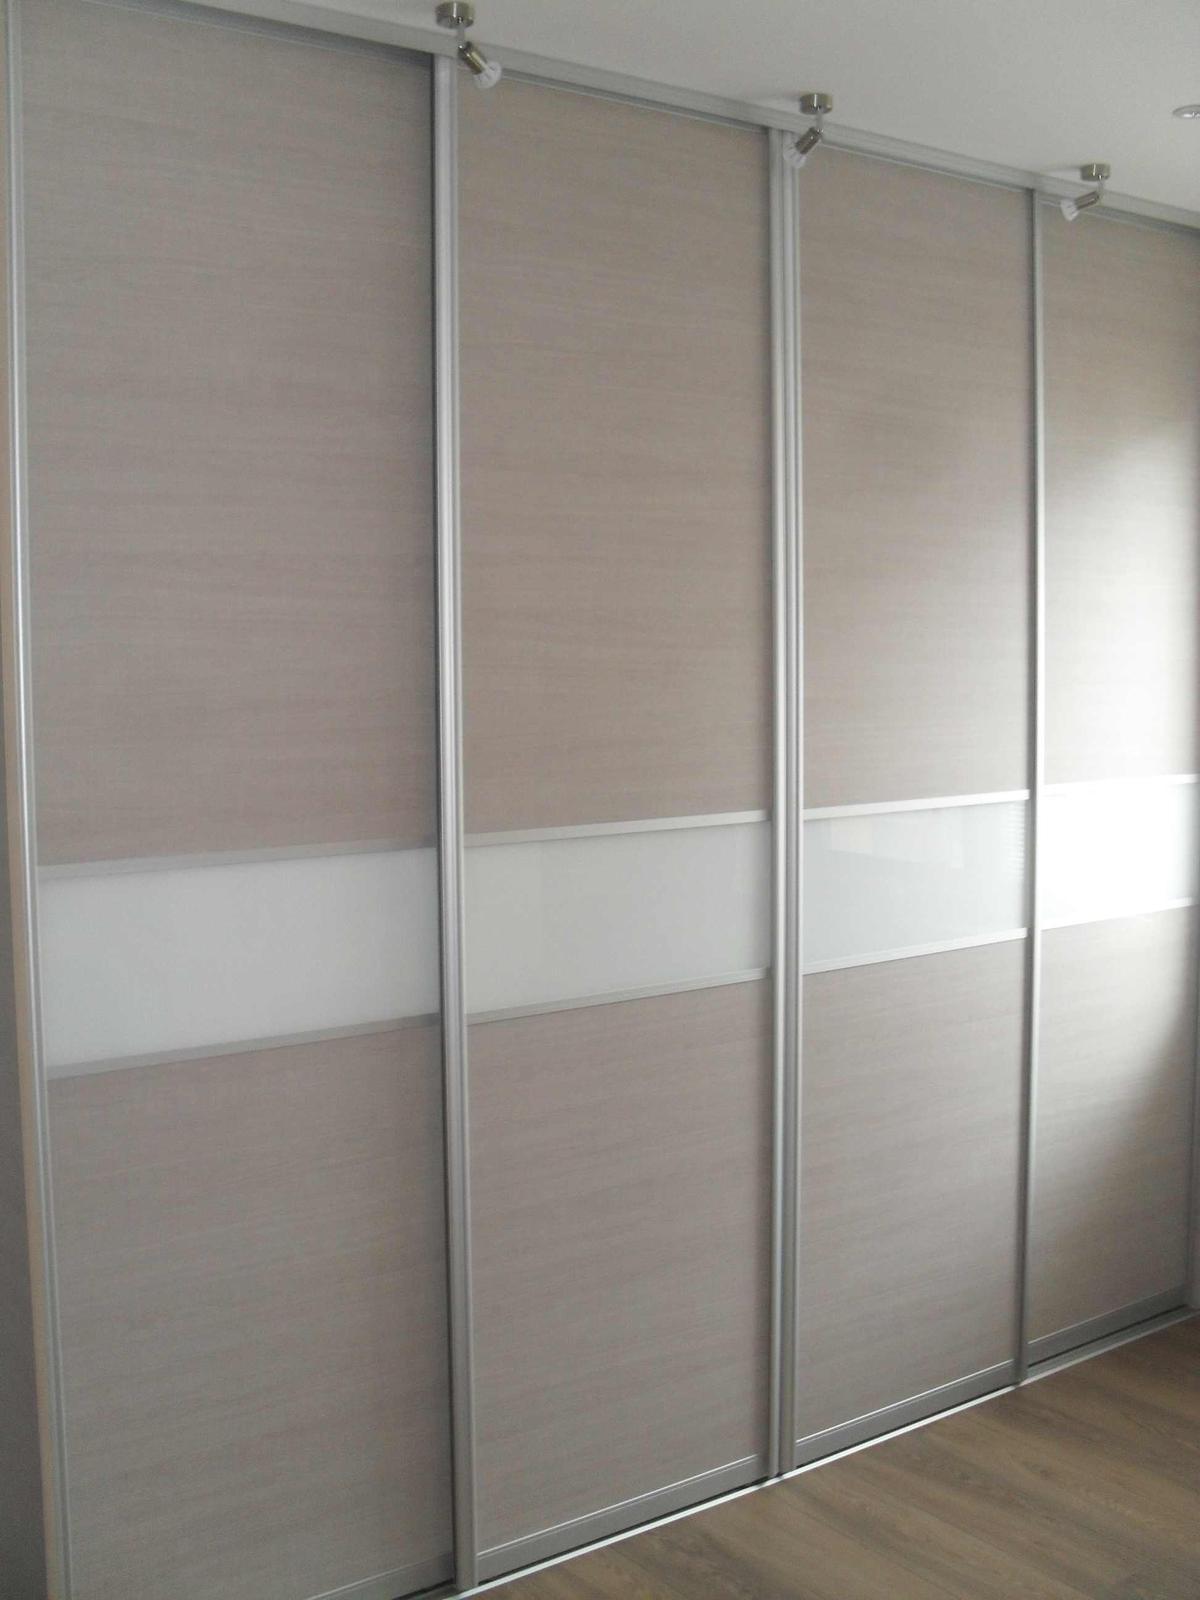 Vstavané skrine Martin Benko Bošany - Obrázok č. 2